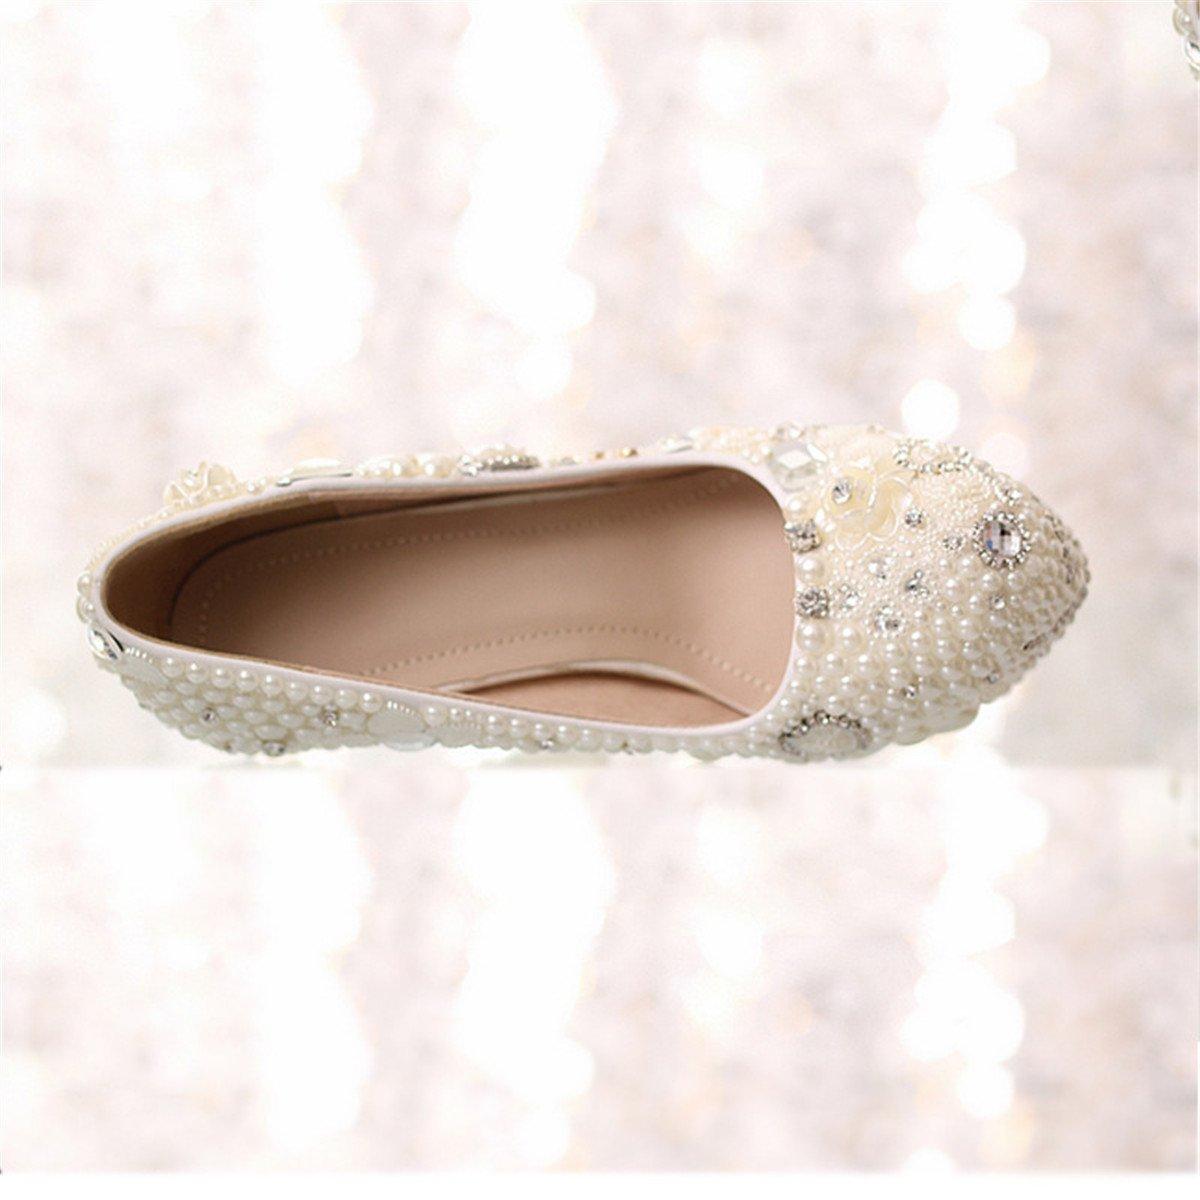 Woherren schuhe Comfort Sandals Walking schuhe schuhe schuhe   Damen Sandalen   Sandalette Crystal Schuhe wasserdicht Taiwan high-heeled Hochzeit Schuhe Weiß Pearl crystal großen Diamanten Hochzeit Schuhe   begleitet Dame Kleid Schuhe   Damenschuhe 1e1bfb